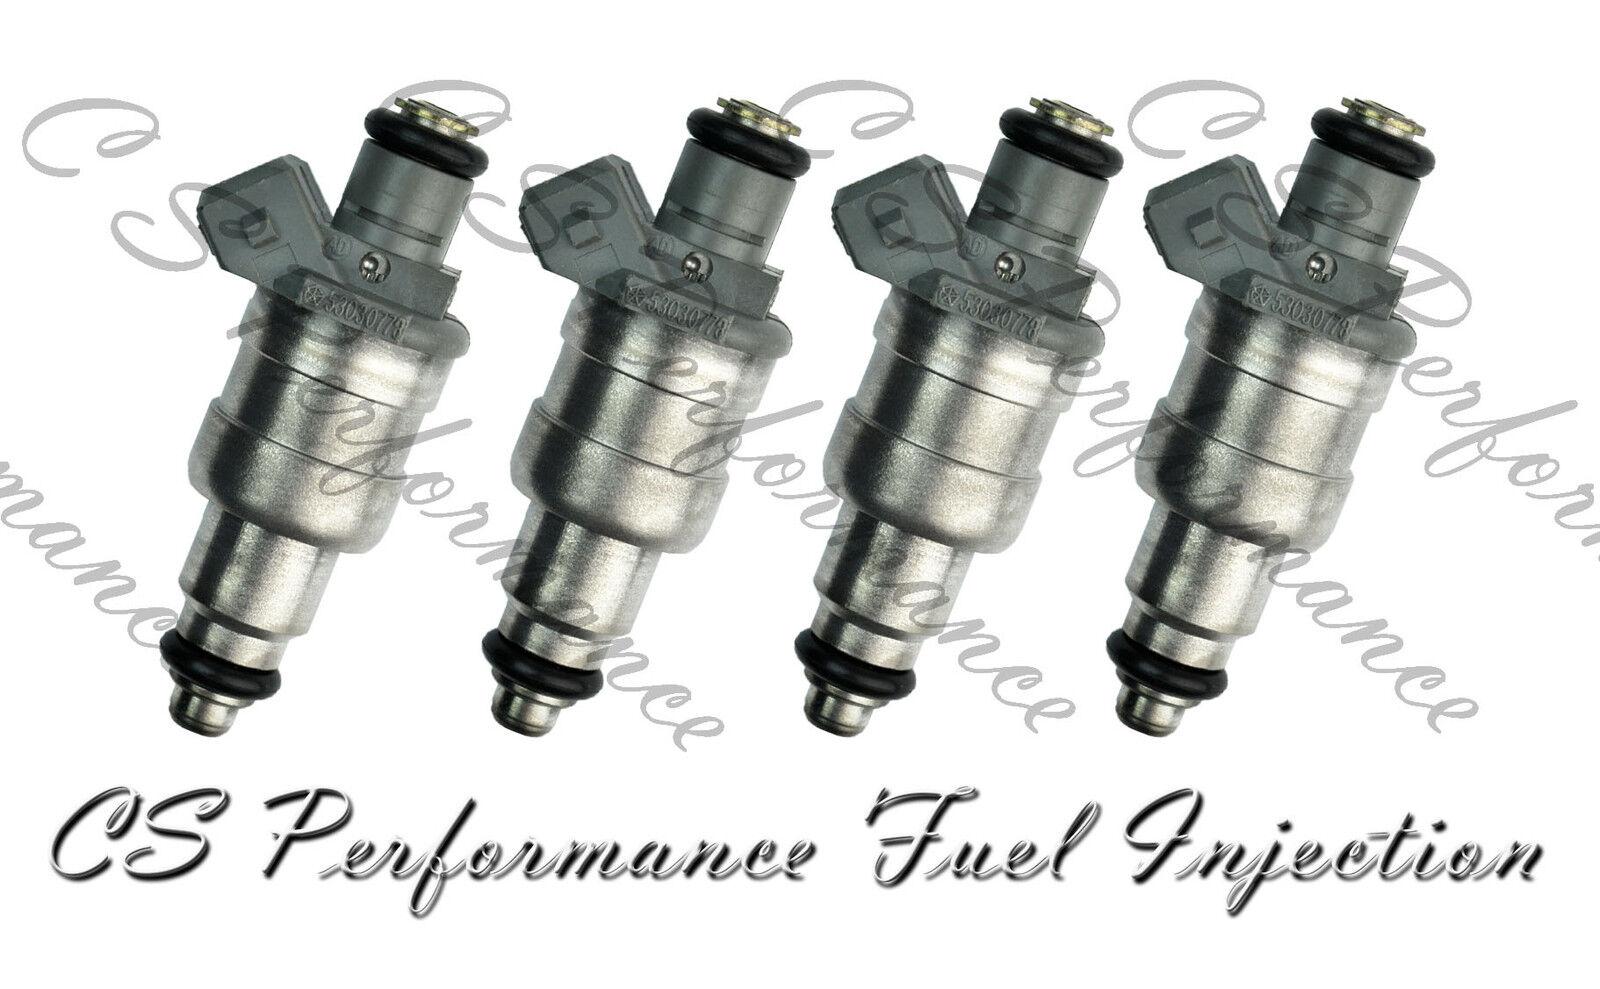 OEM Siemens Fuel Injectors Set (4) 53030778 for 1996-2002